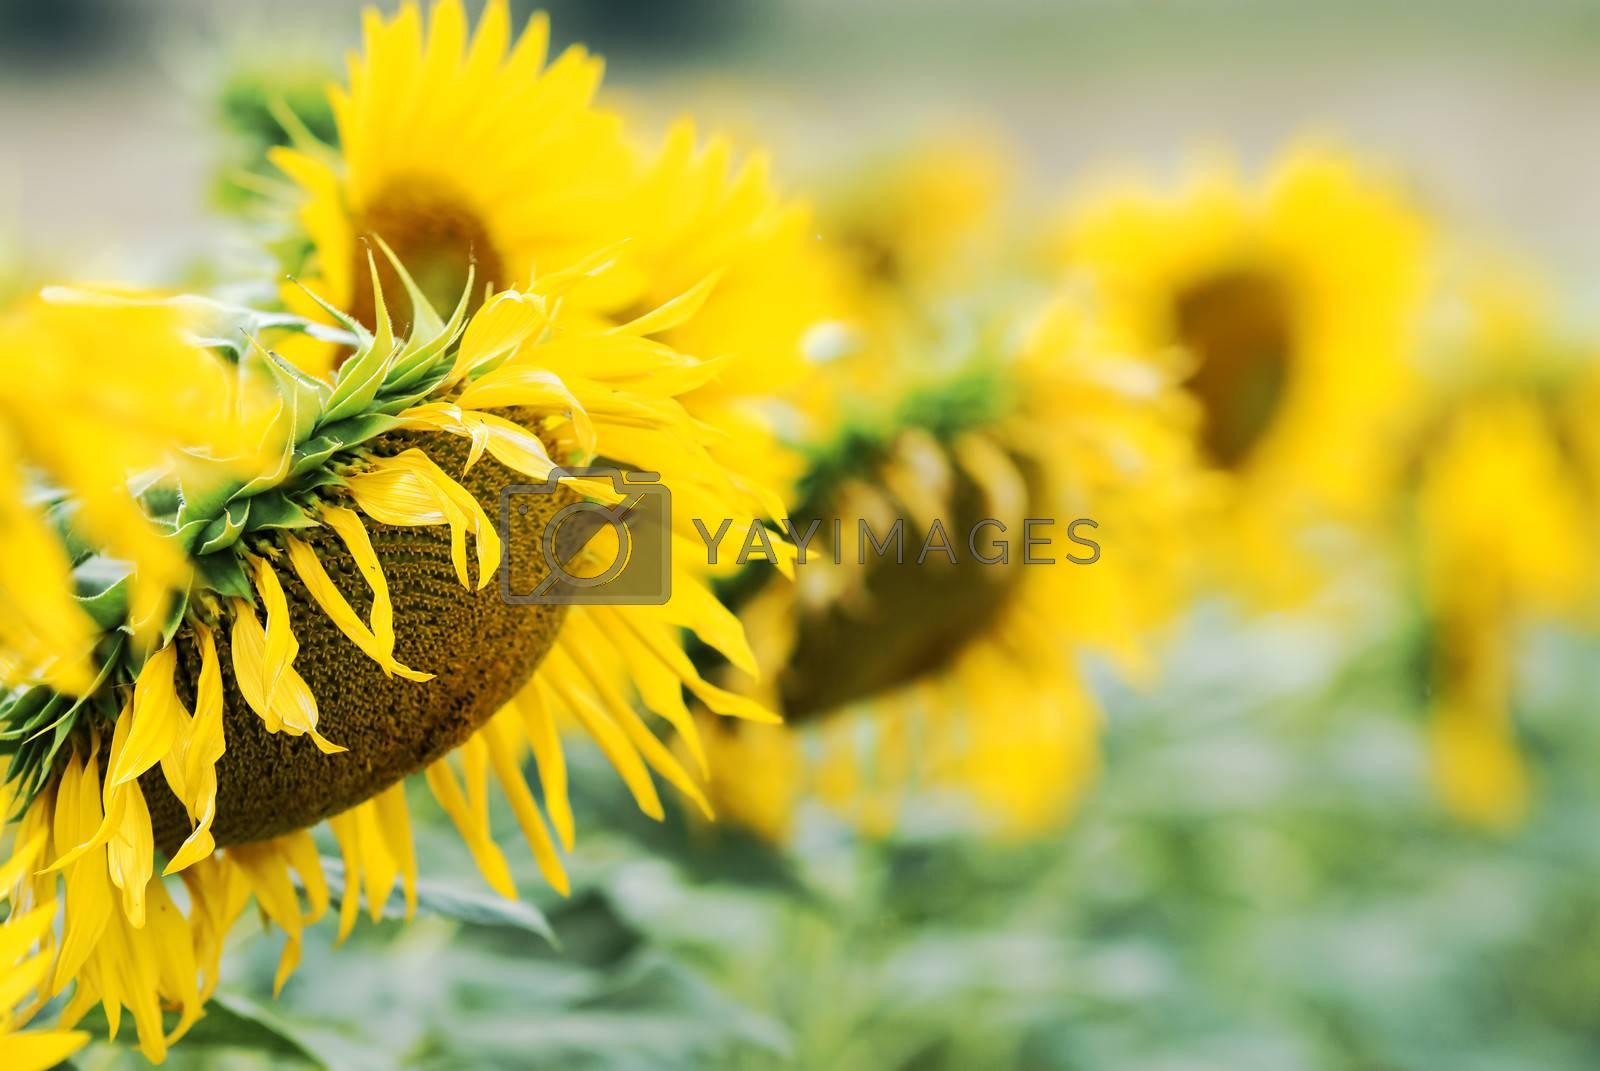 sunflowers by gufoto